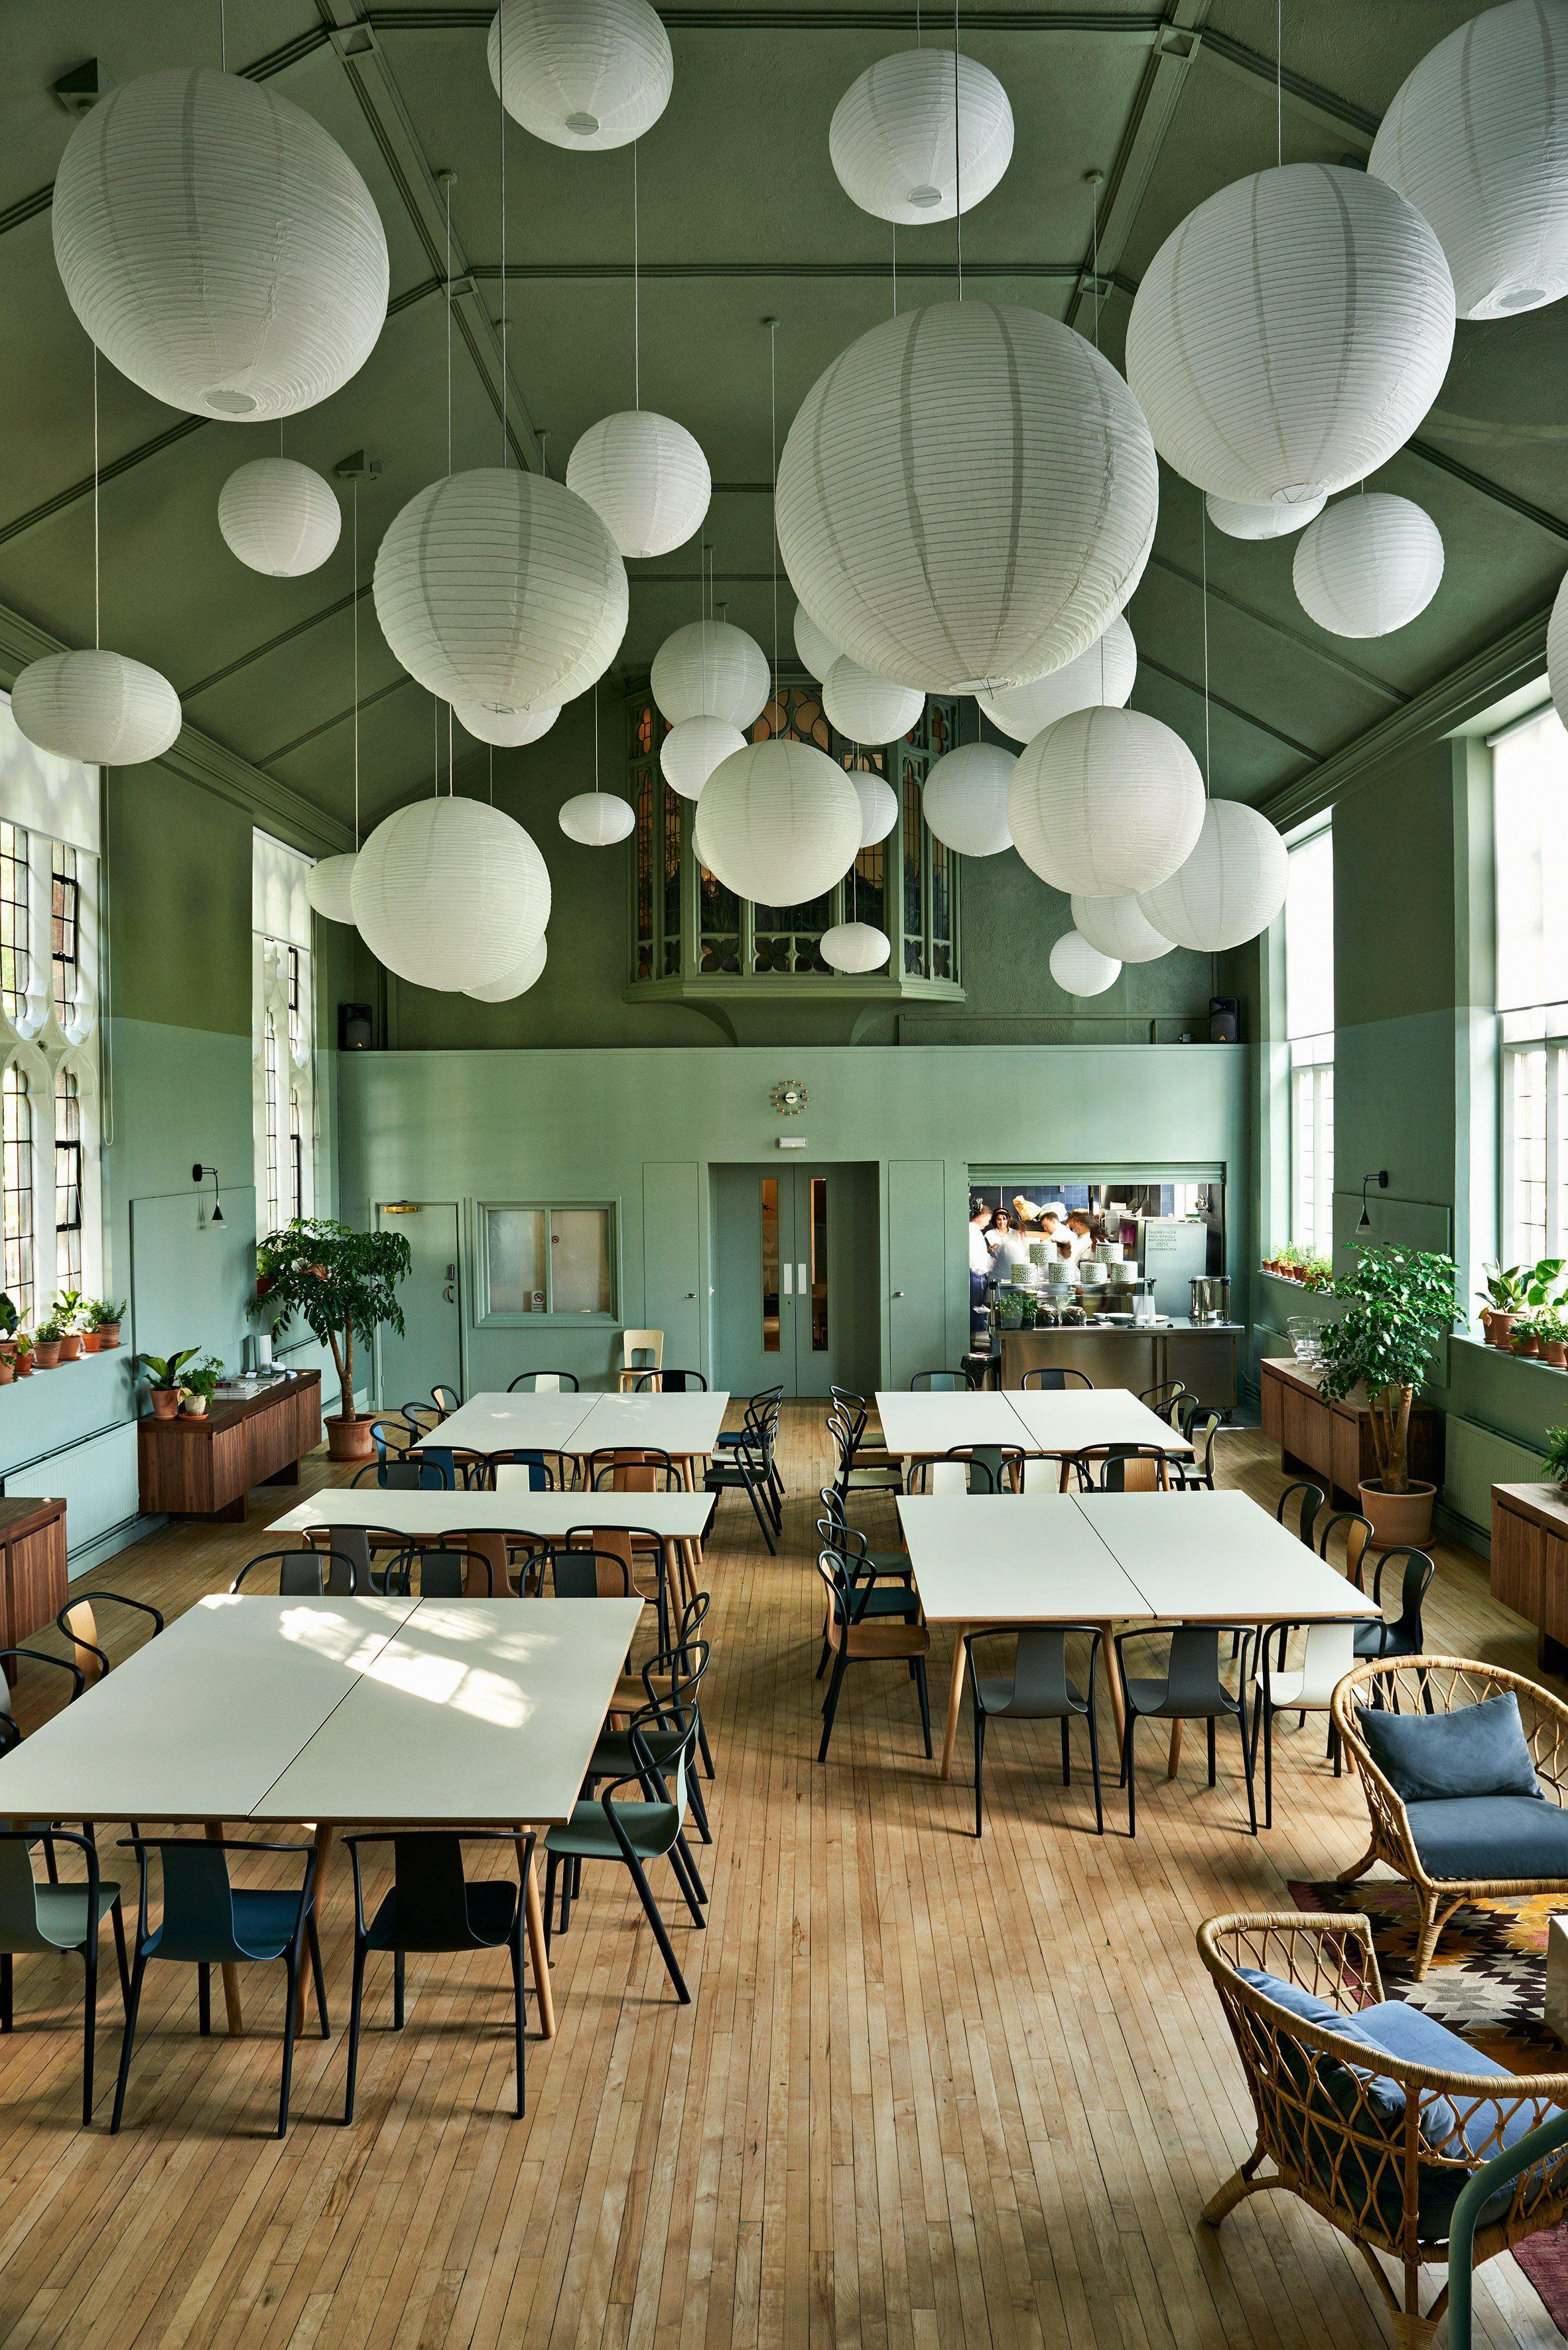 ilse crawford creates intimate interiors for refettorio felix soup